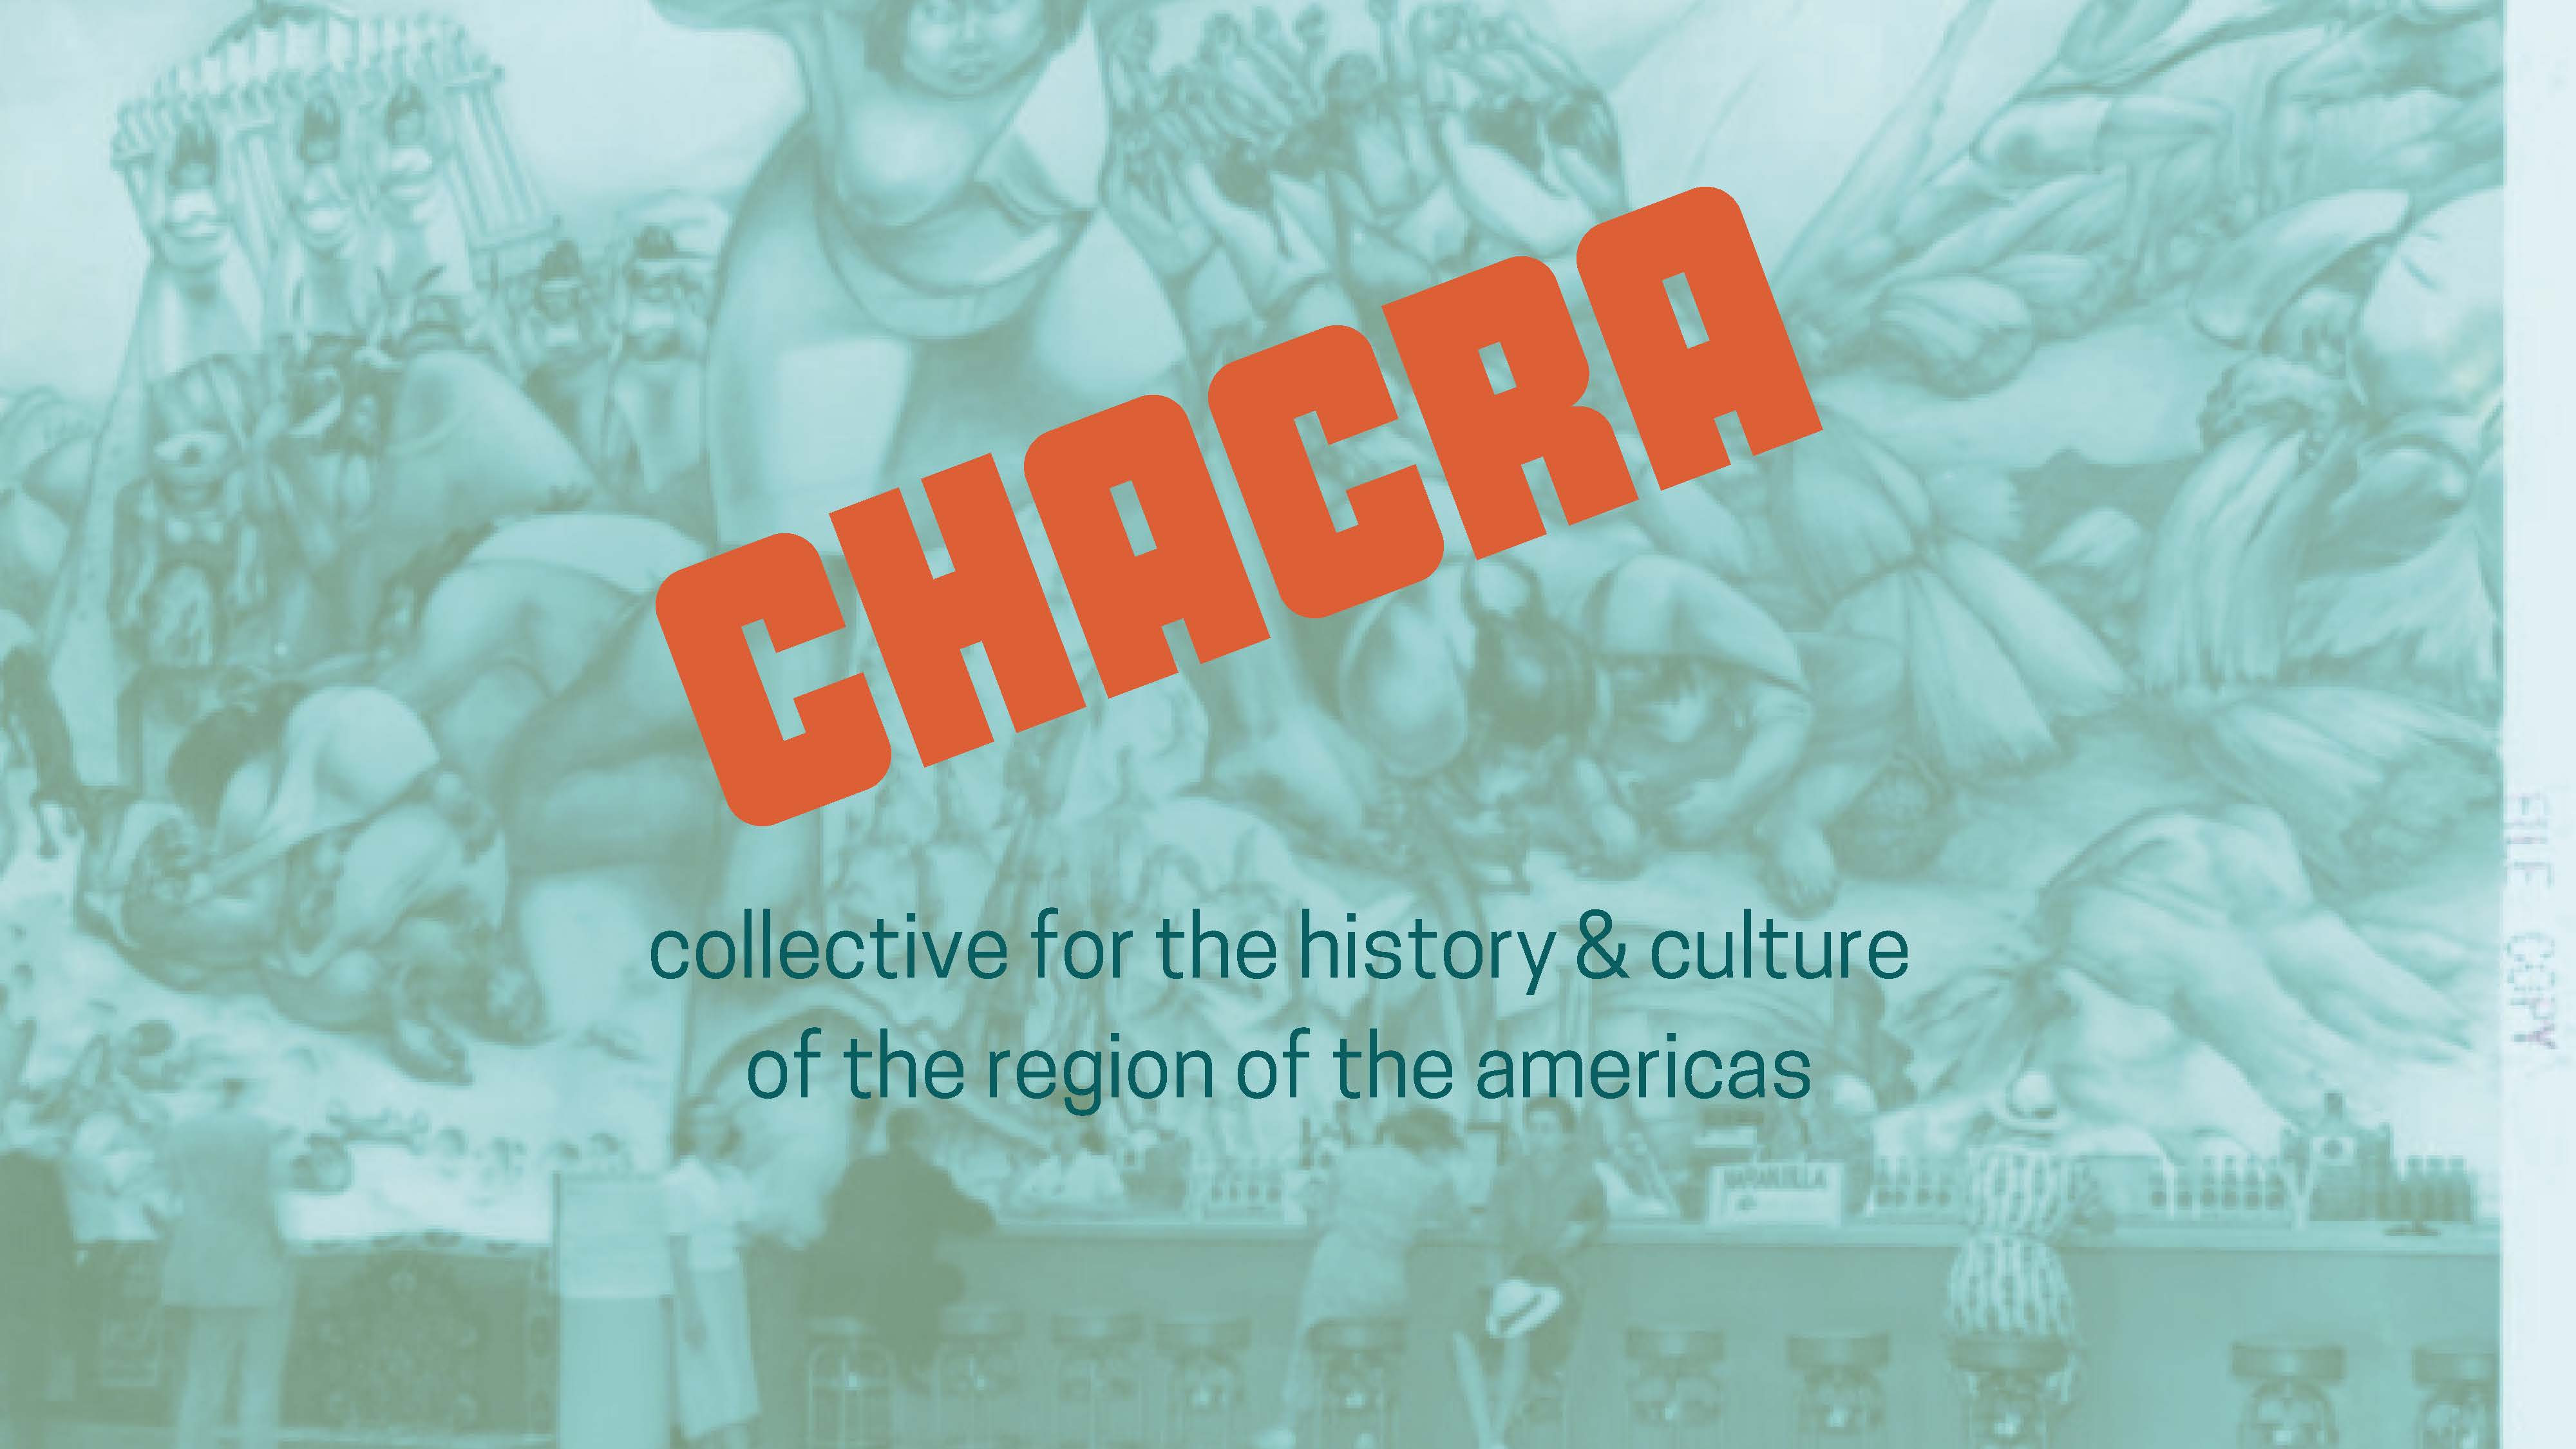 Chacra Image